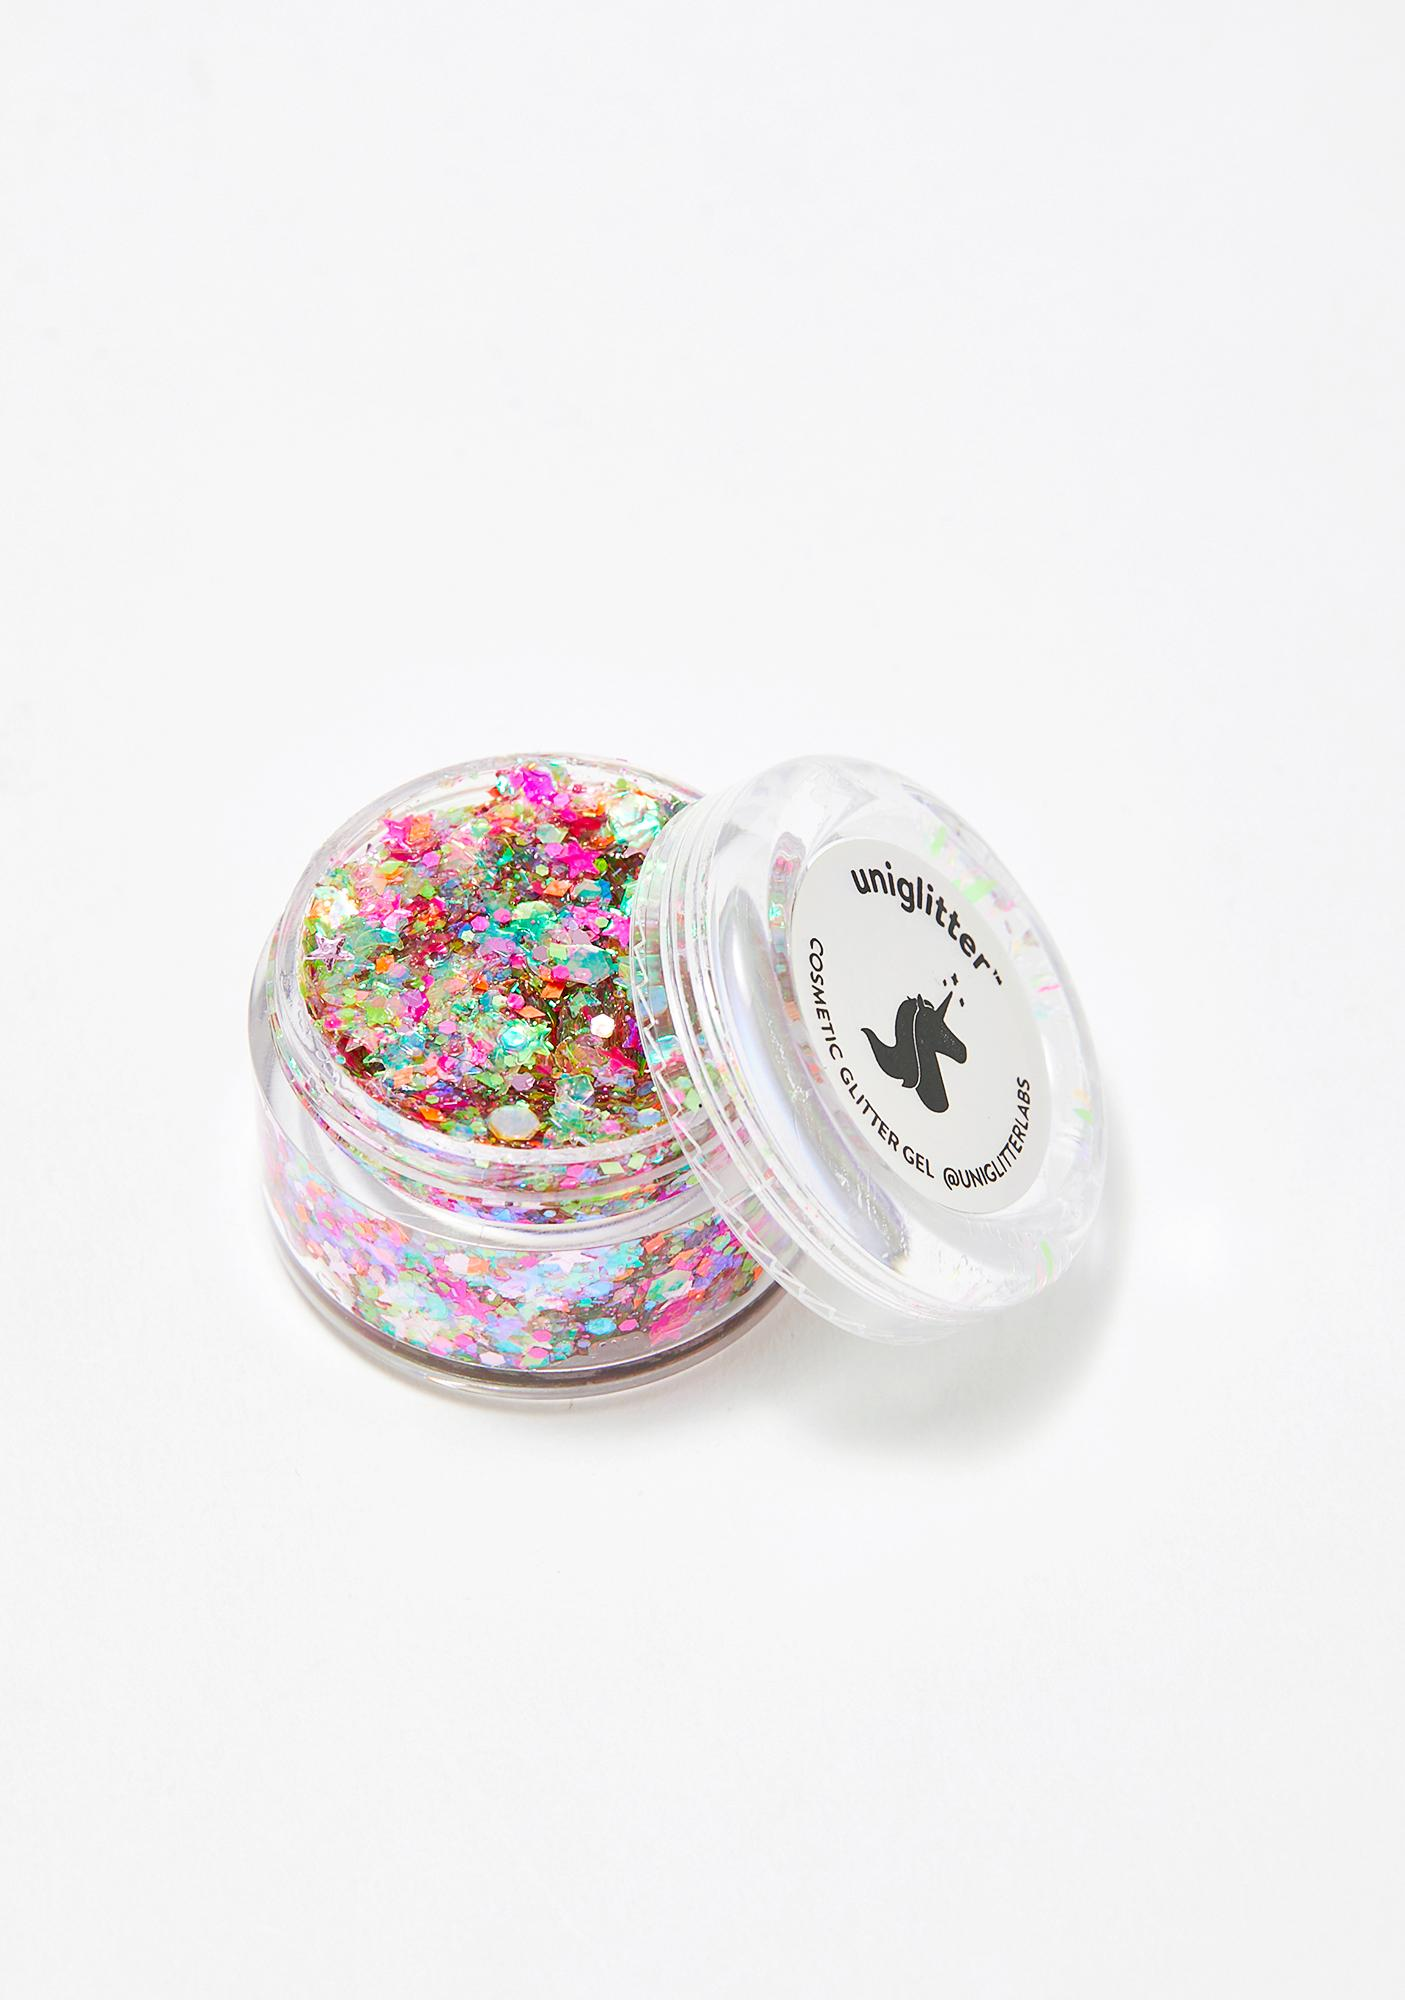 Uniglitter Cosmic Rainbow UV Unicorn Glitter Gel